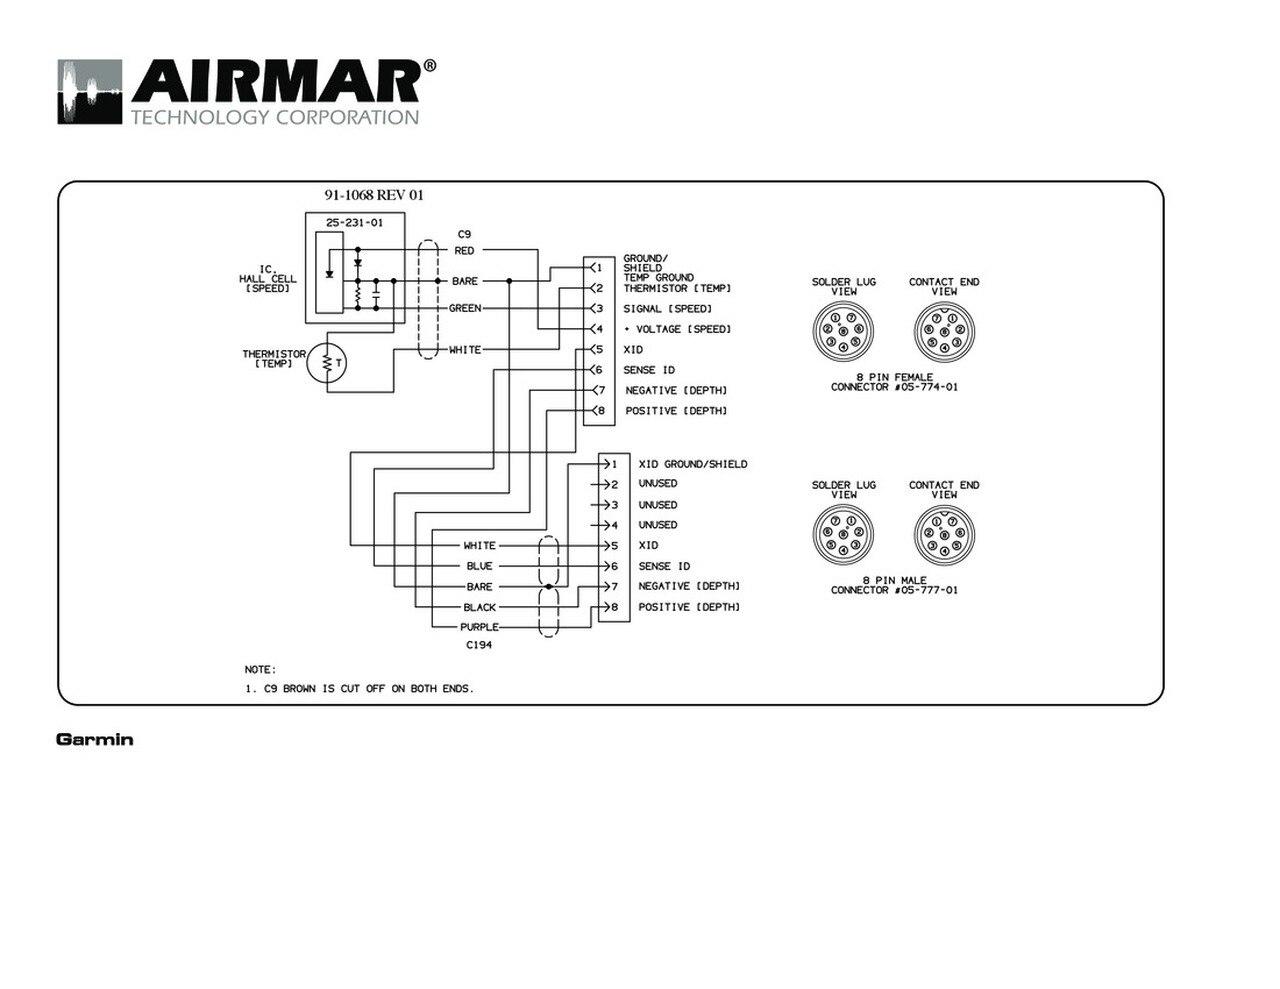 Rz Dcc Wiring Diagrams Moreover Frog Juicer Wiring